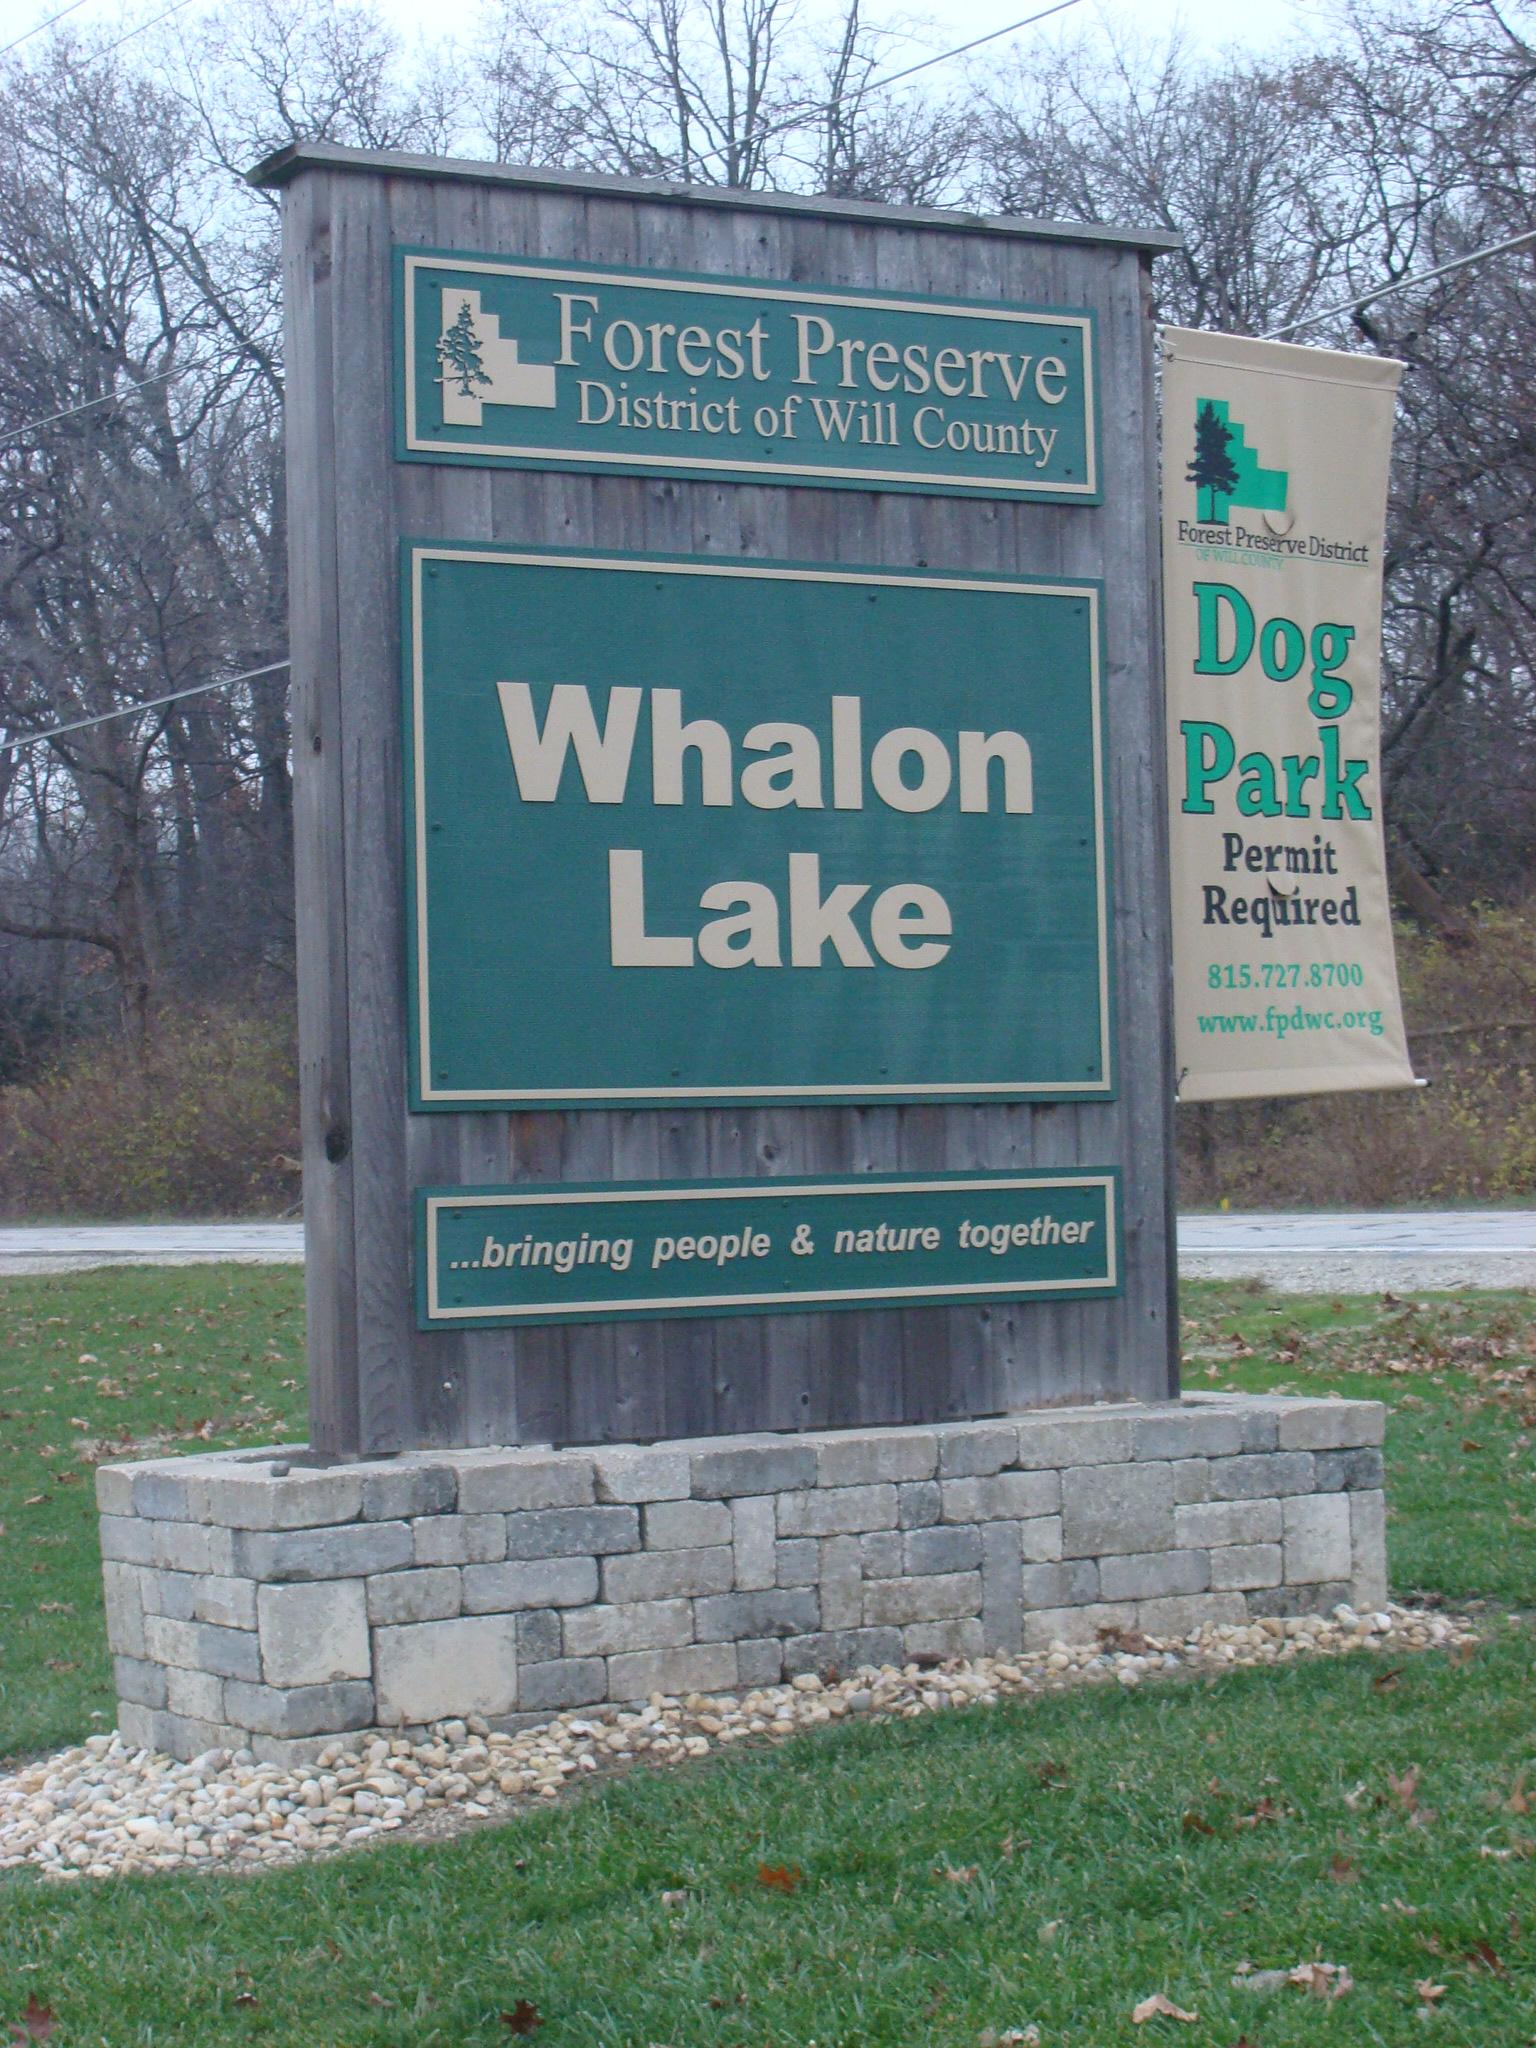 whalon lake sign.jpg